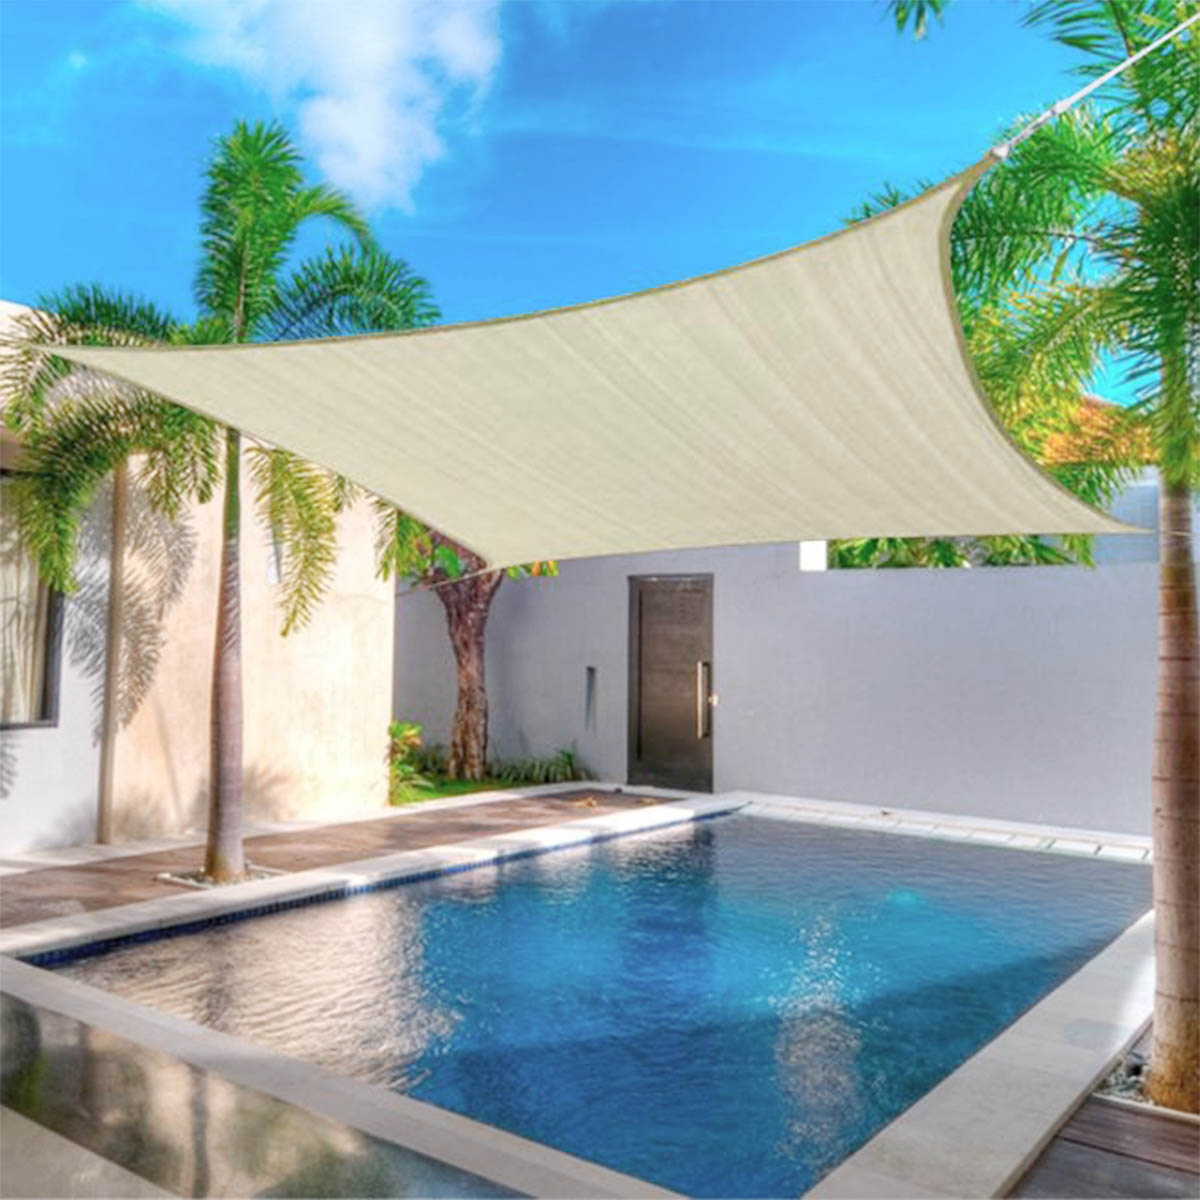 160gsm 300d sun shade sail waterproof shade sail sun uv block garden patio sunscreen awning canopy for outdoor activities